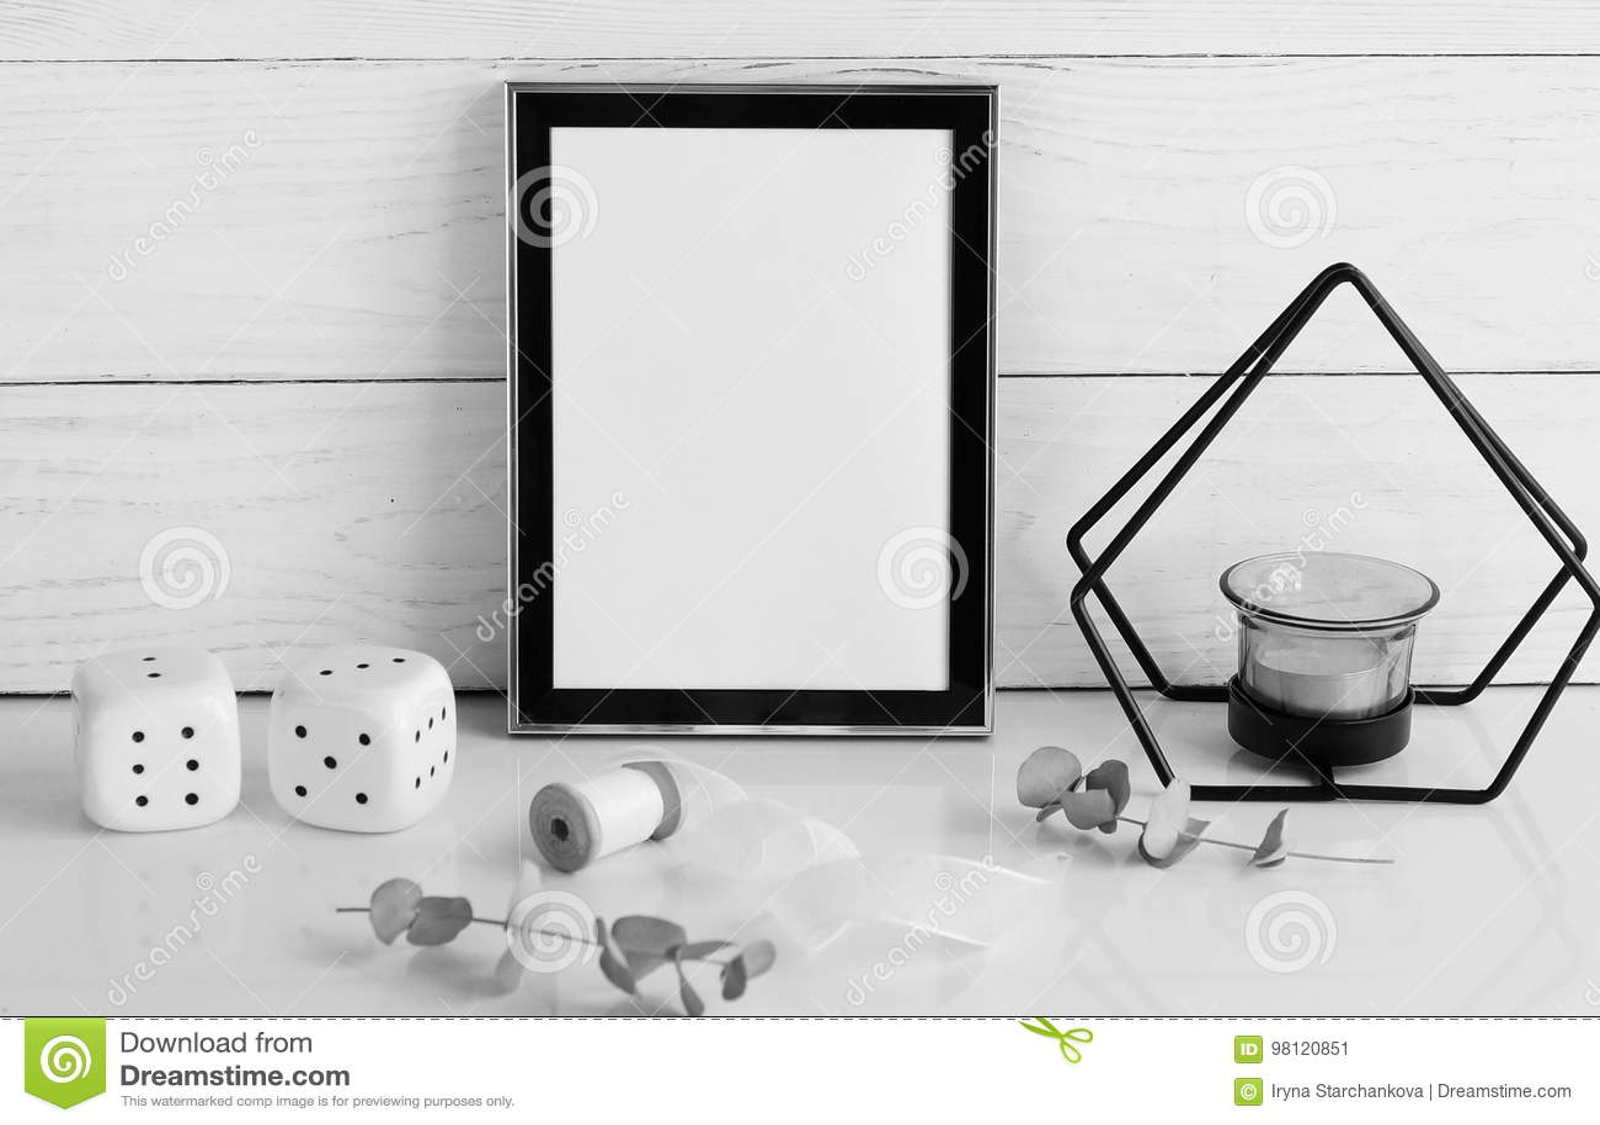 Black frame mockup with interior items